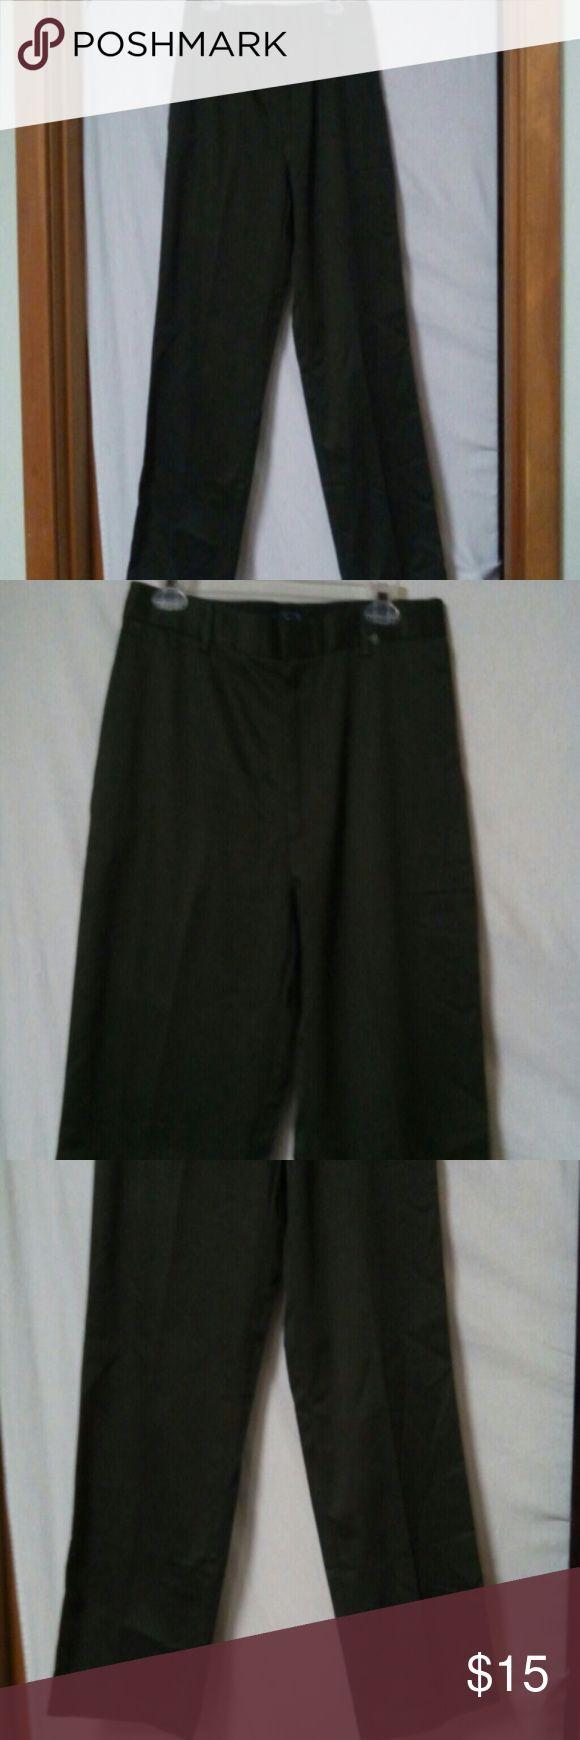 "Dockers mens size 32"" anti wrinkle khaki pants NWT"